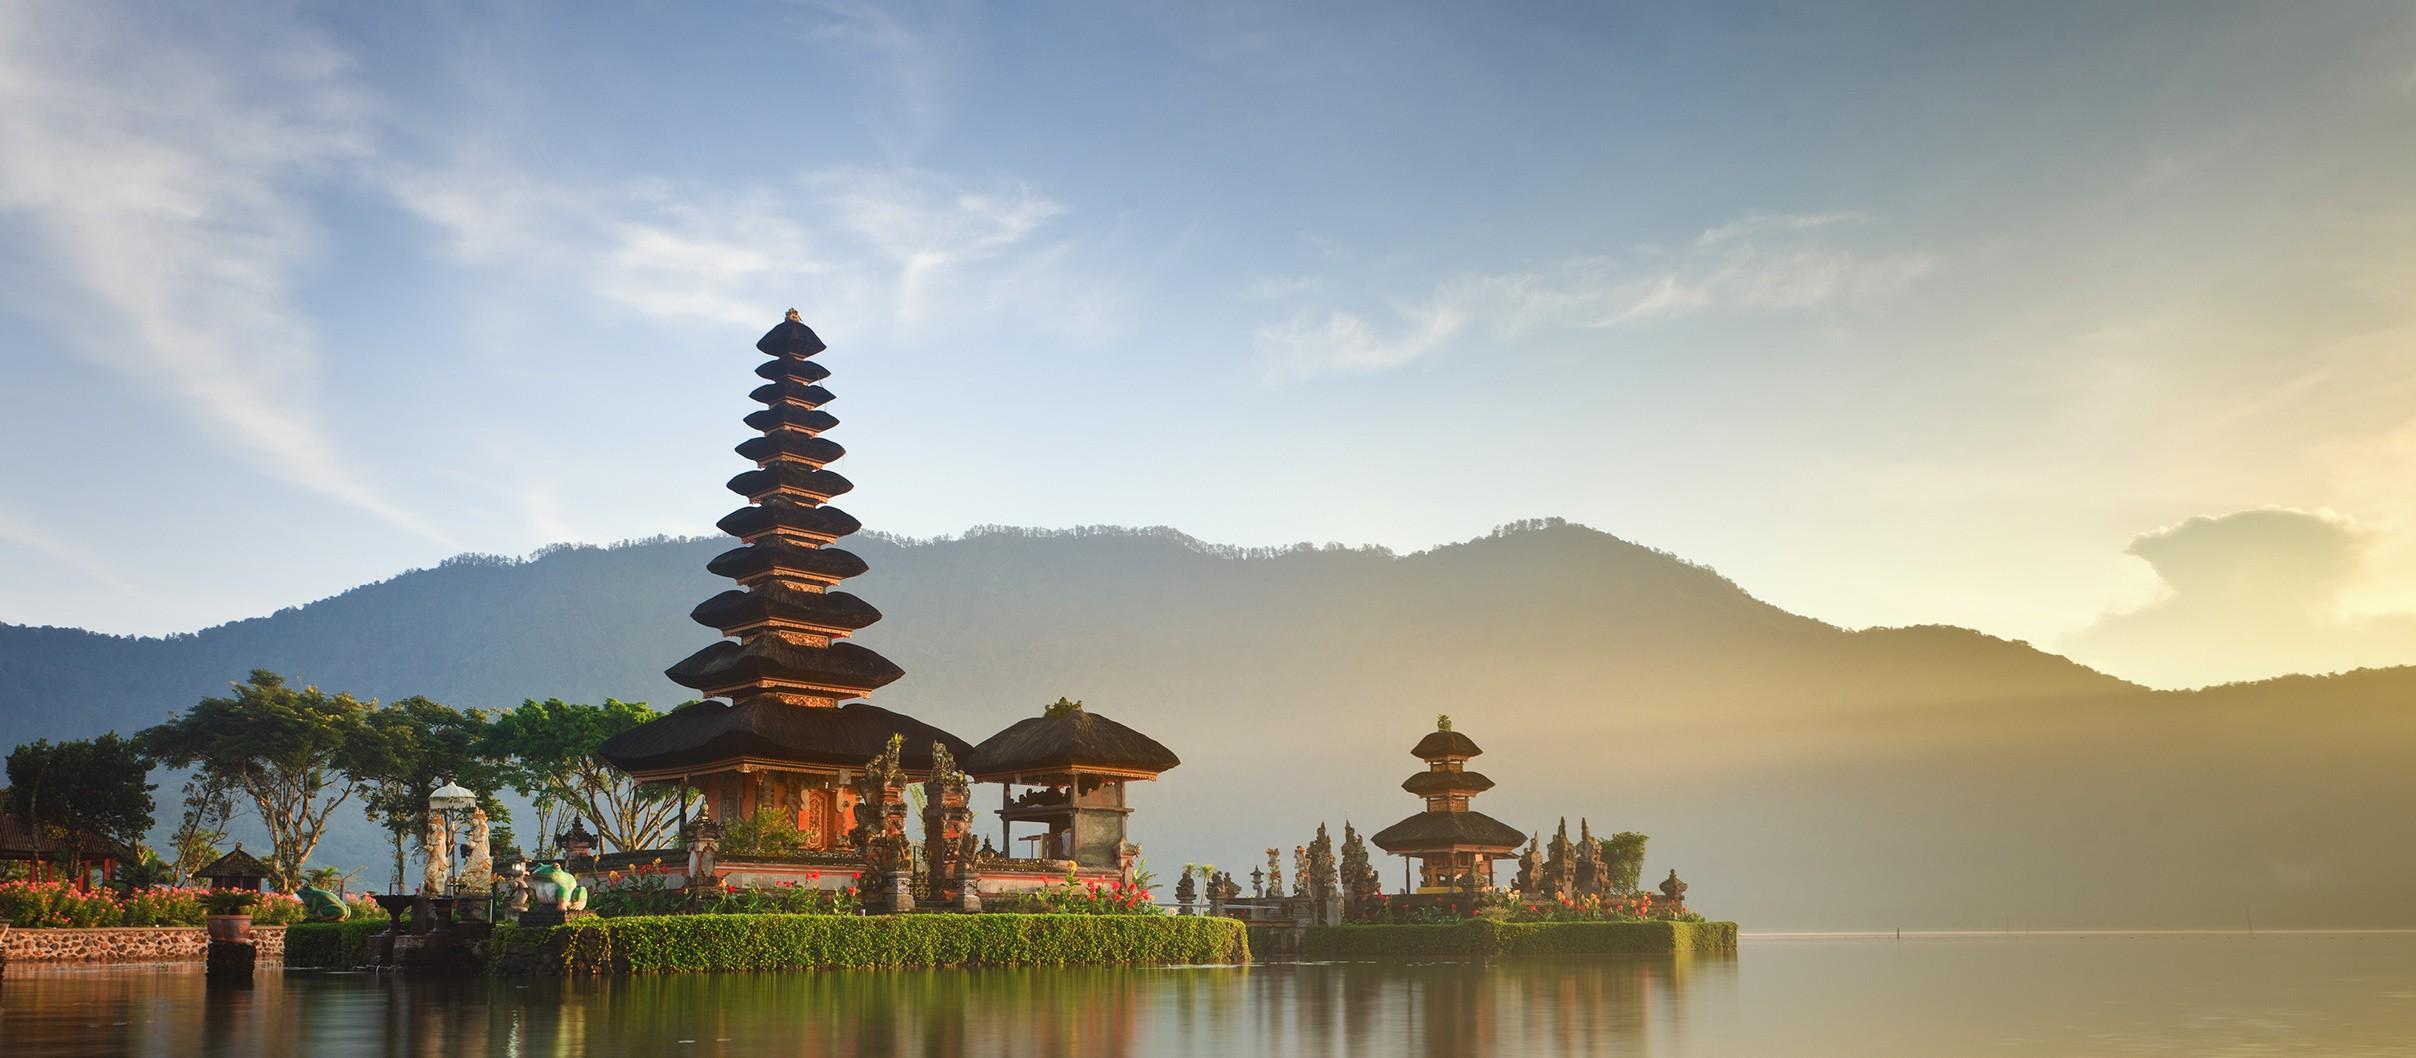 Discover Bali & Indonesia Archipelago